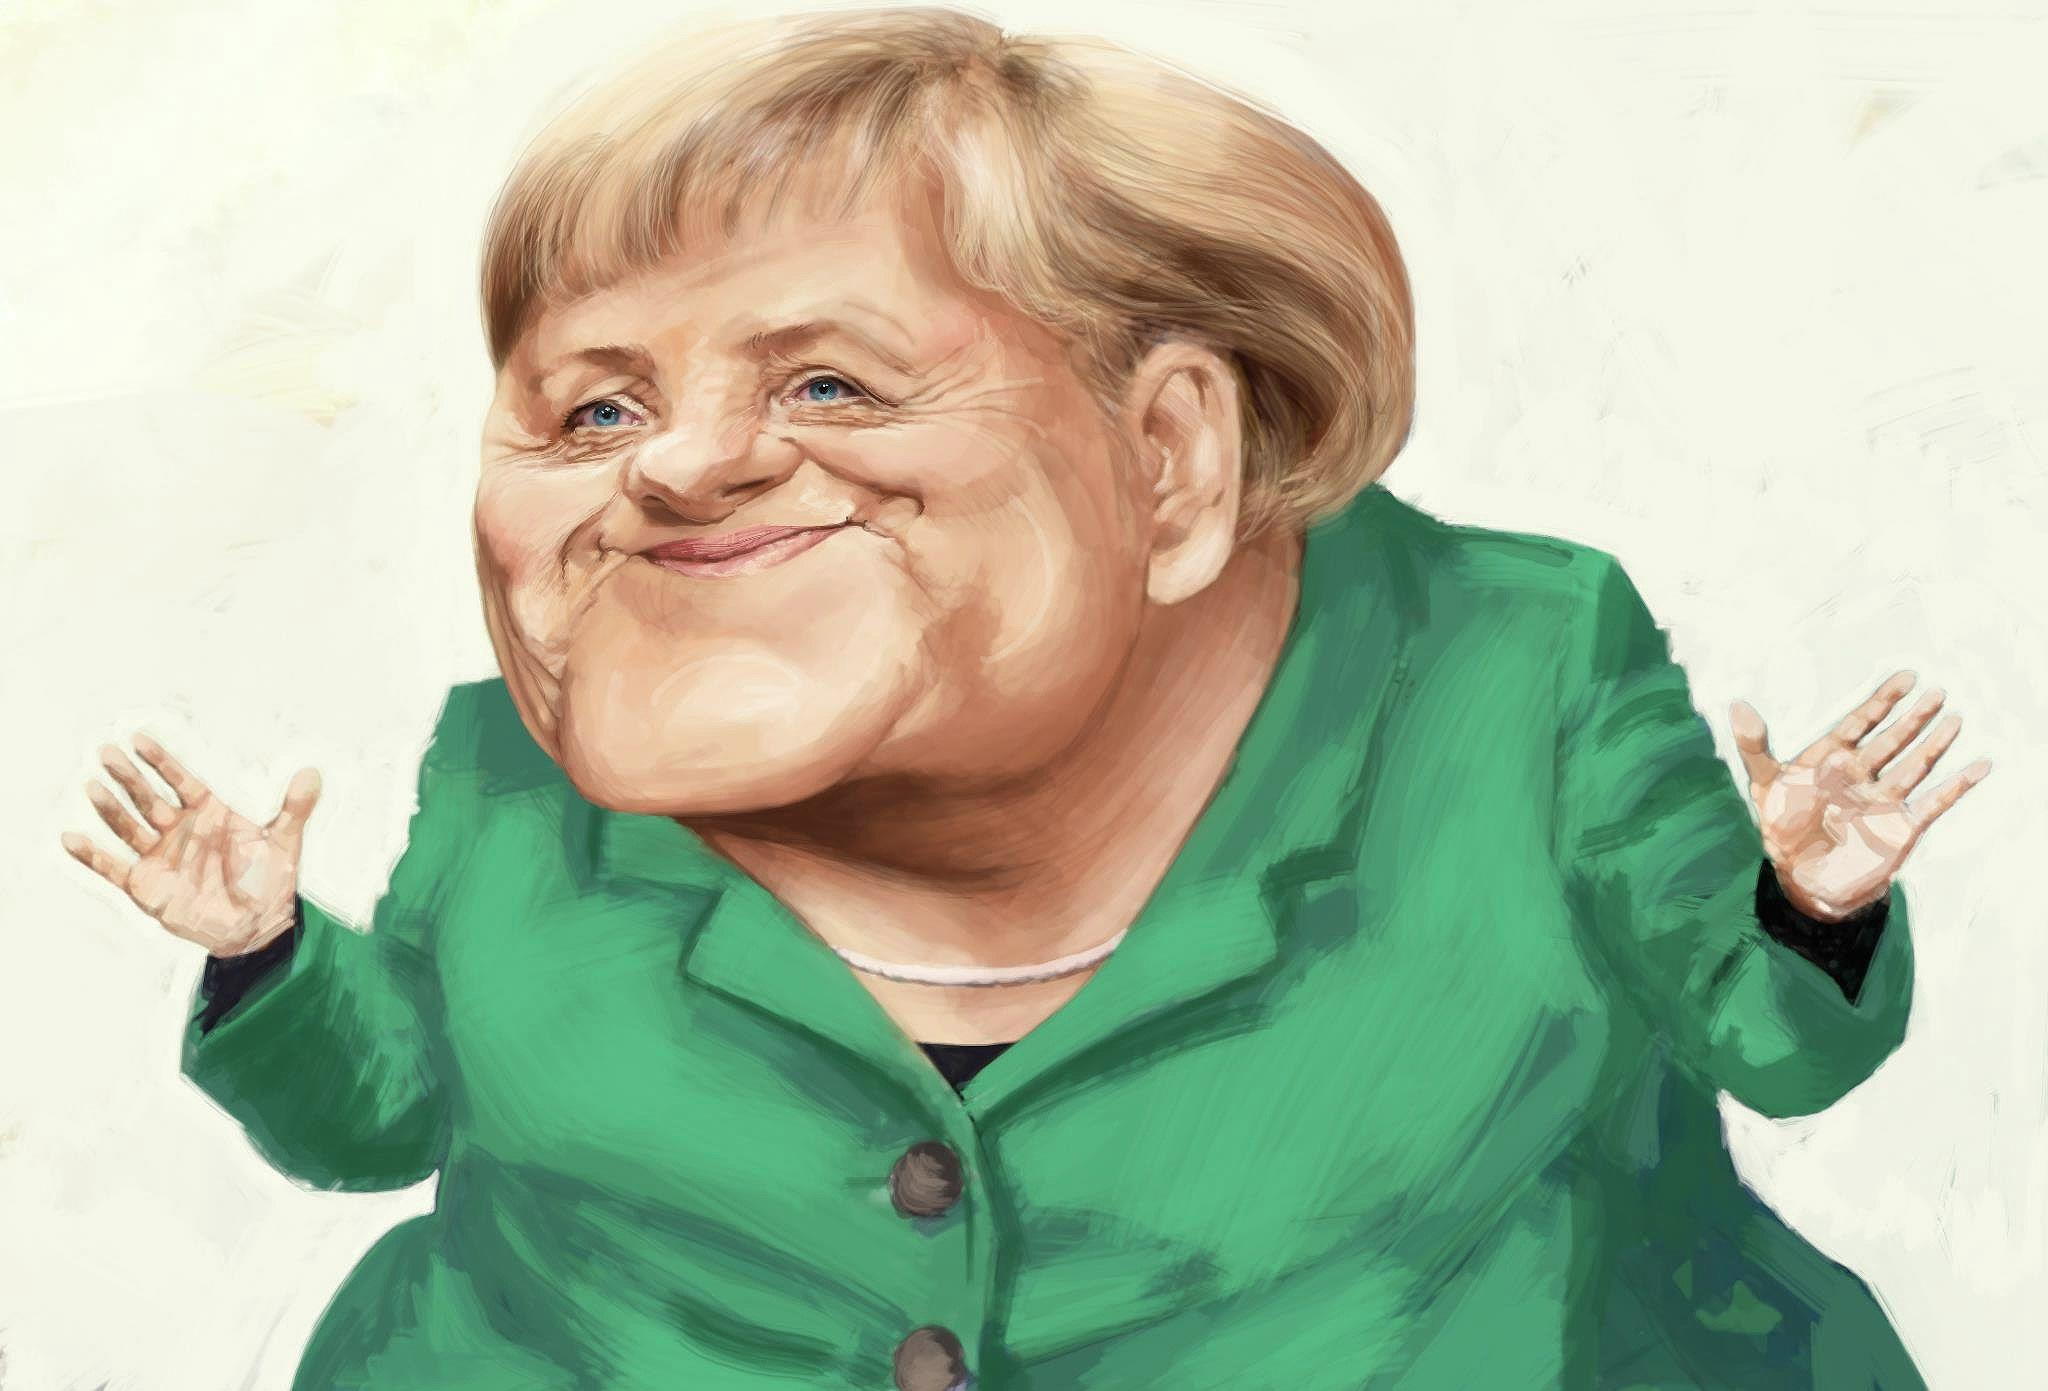 Caricatura de Angela Merkel